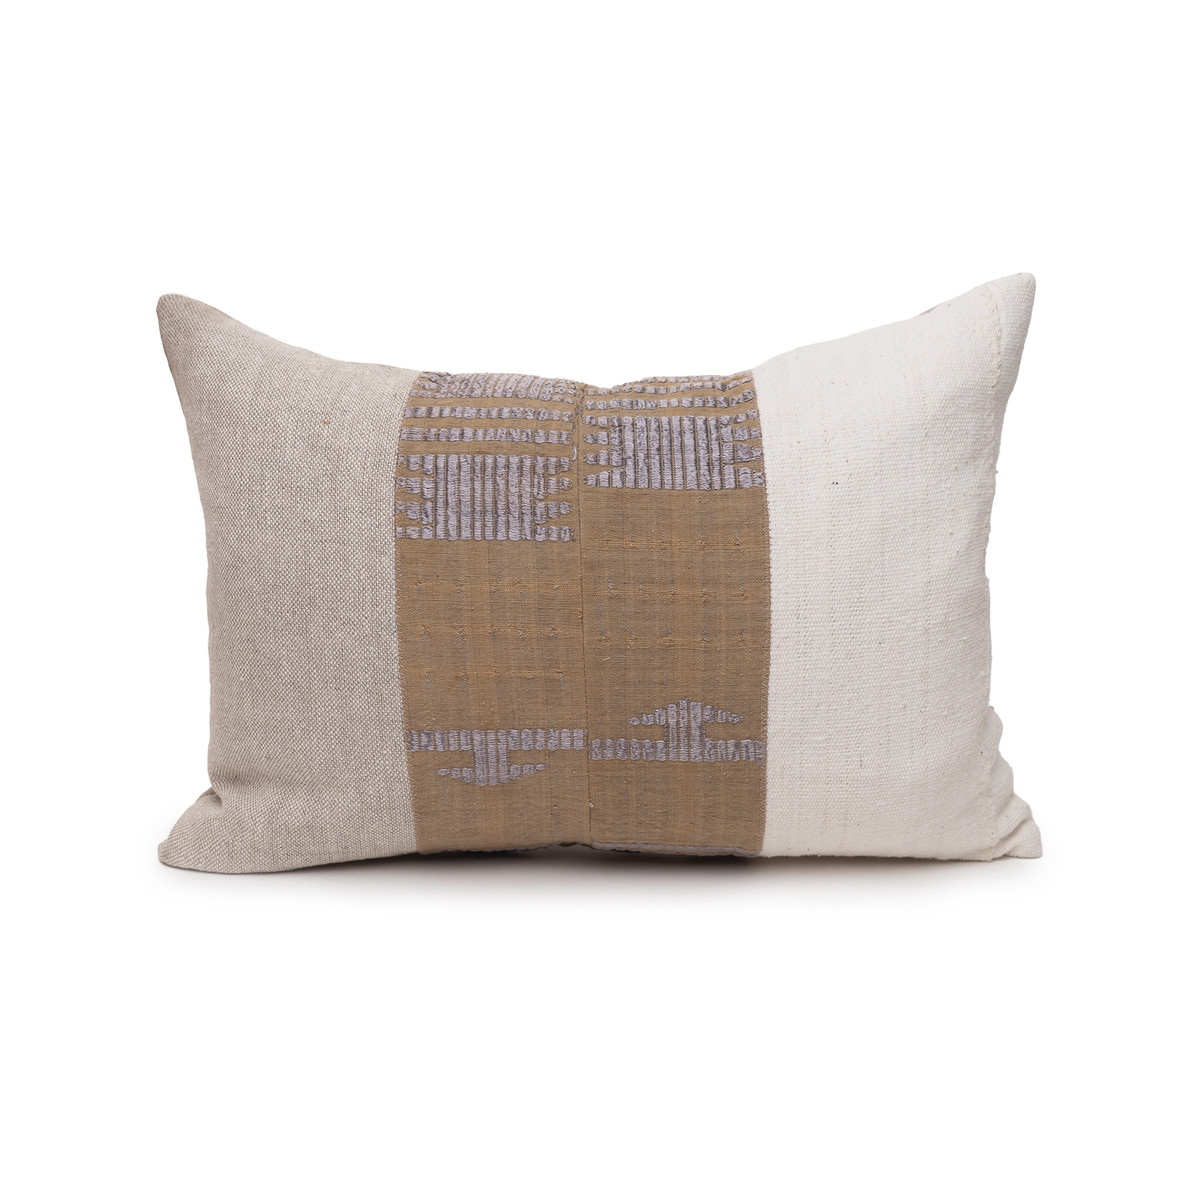 Graystone Aso Oke Vintage Textile Lumbar Pillow - 1420 - Front